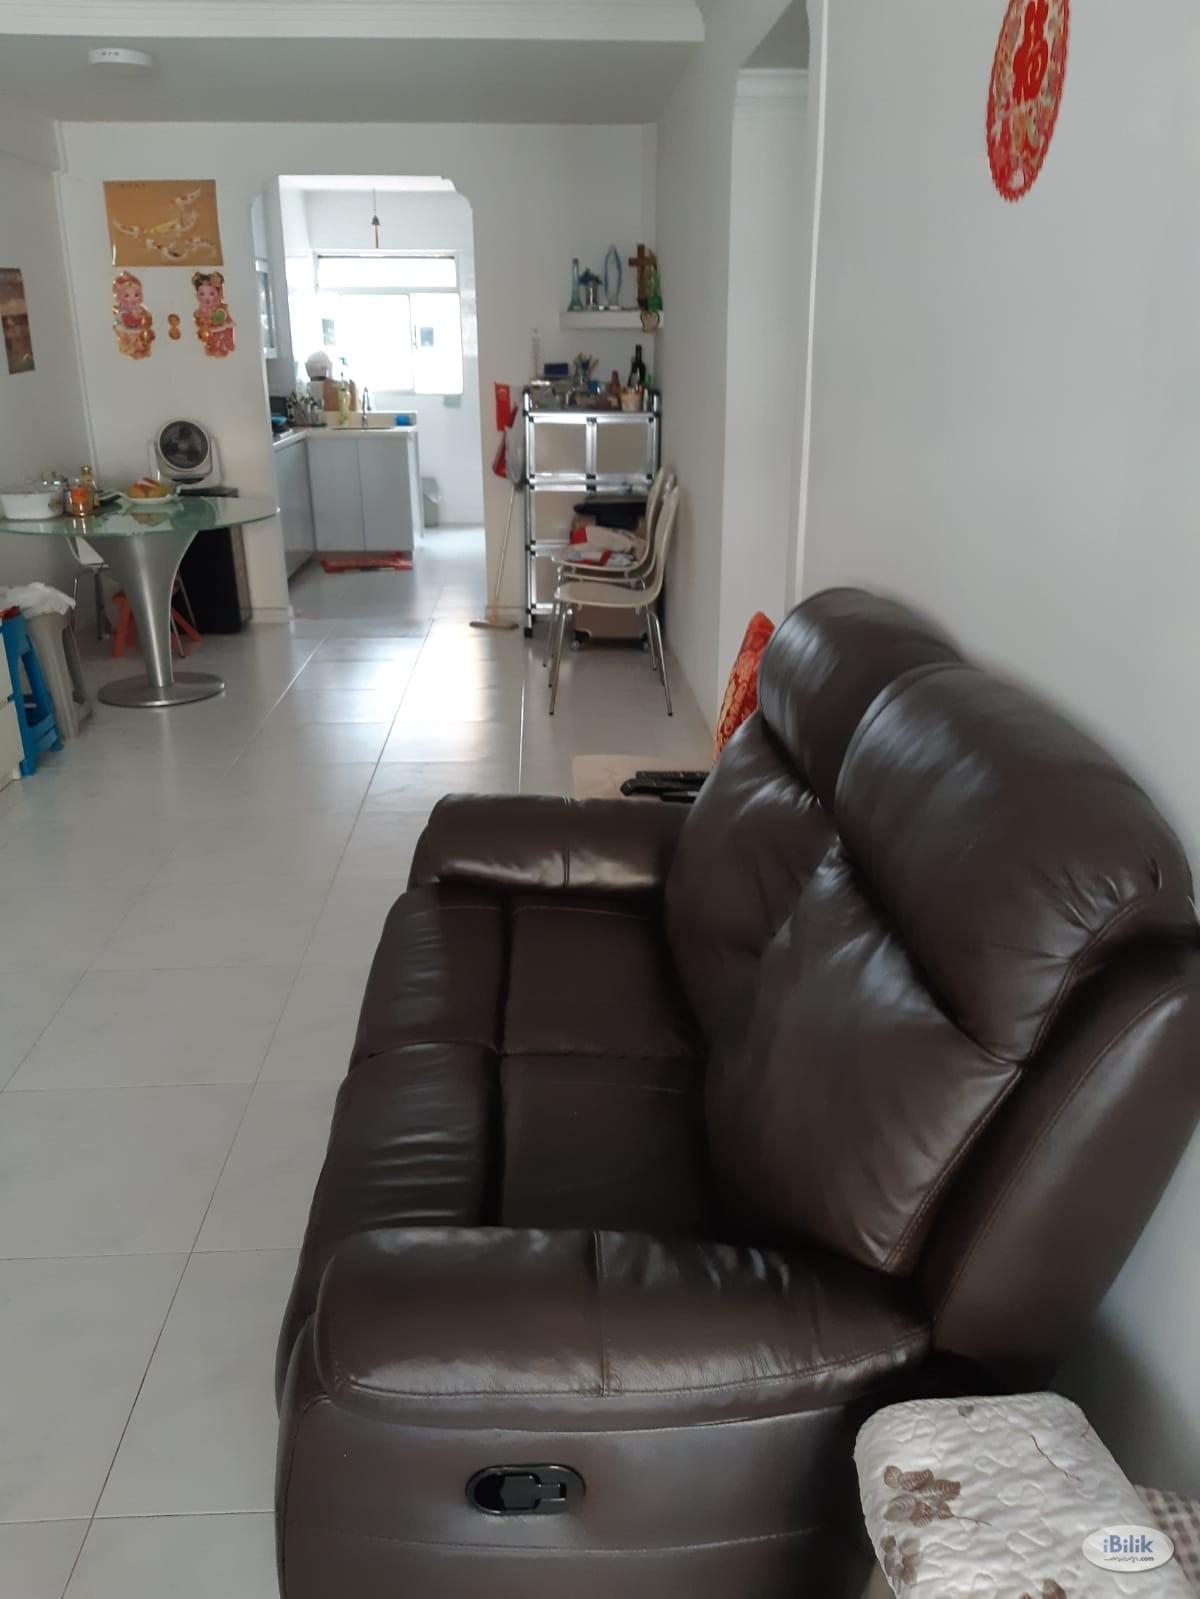 Common room at 346 ang mo kio avenue 3 for rent! Aircon wifi!